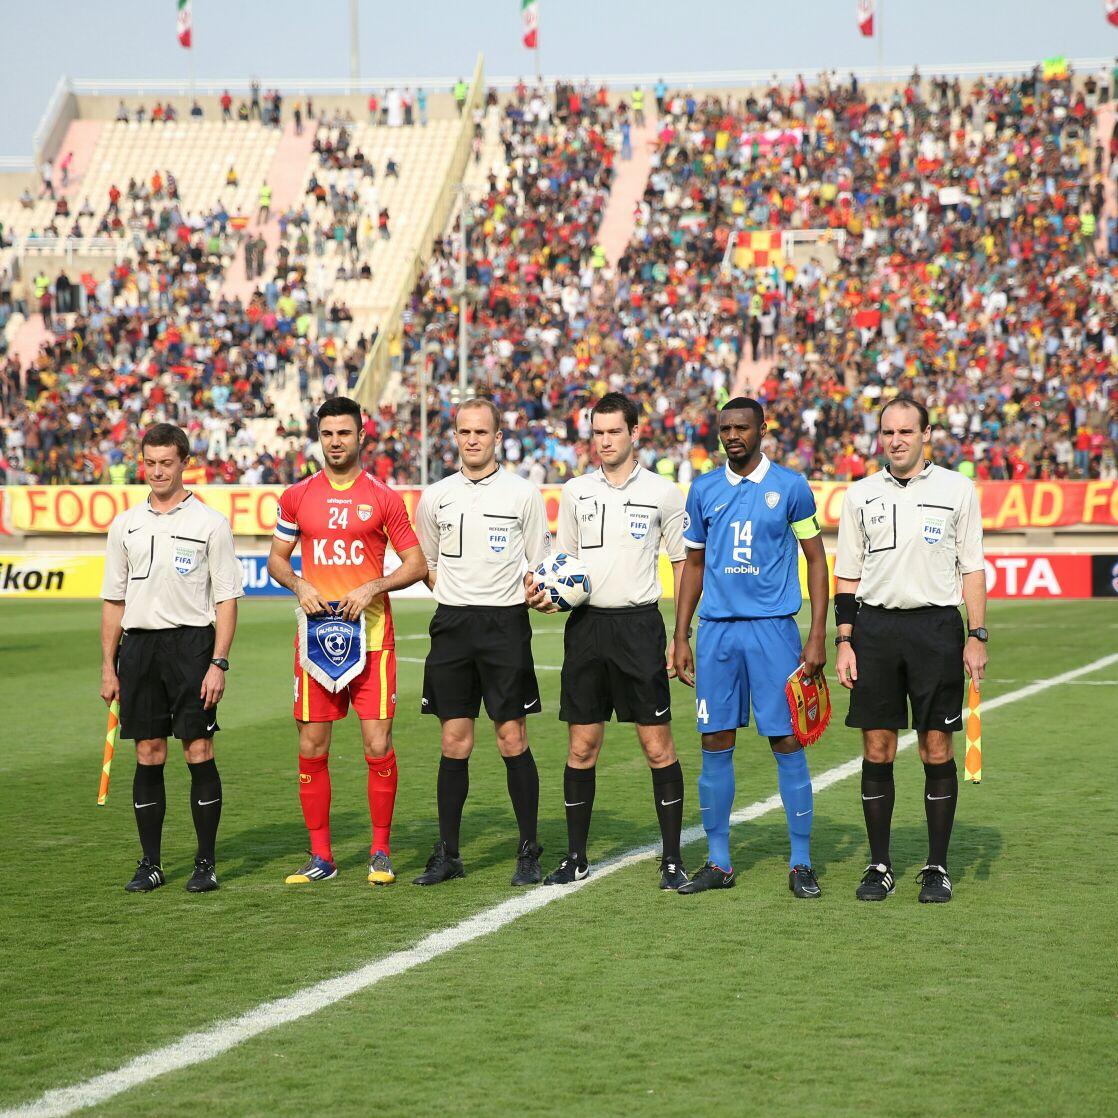 Al Hilal vs Foolad Khozestan